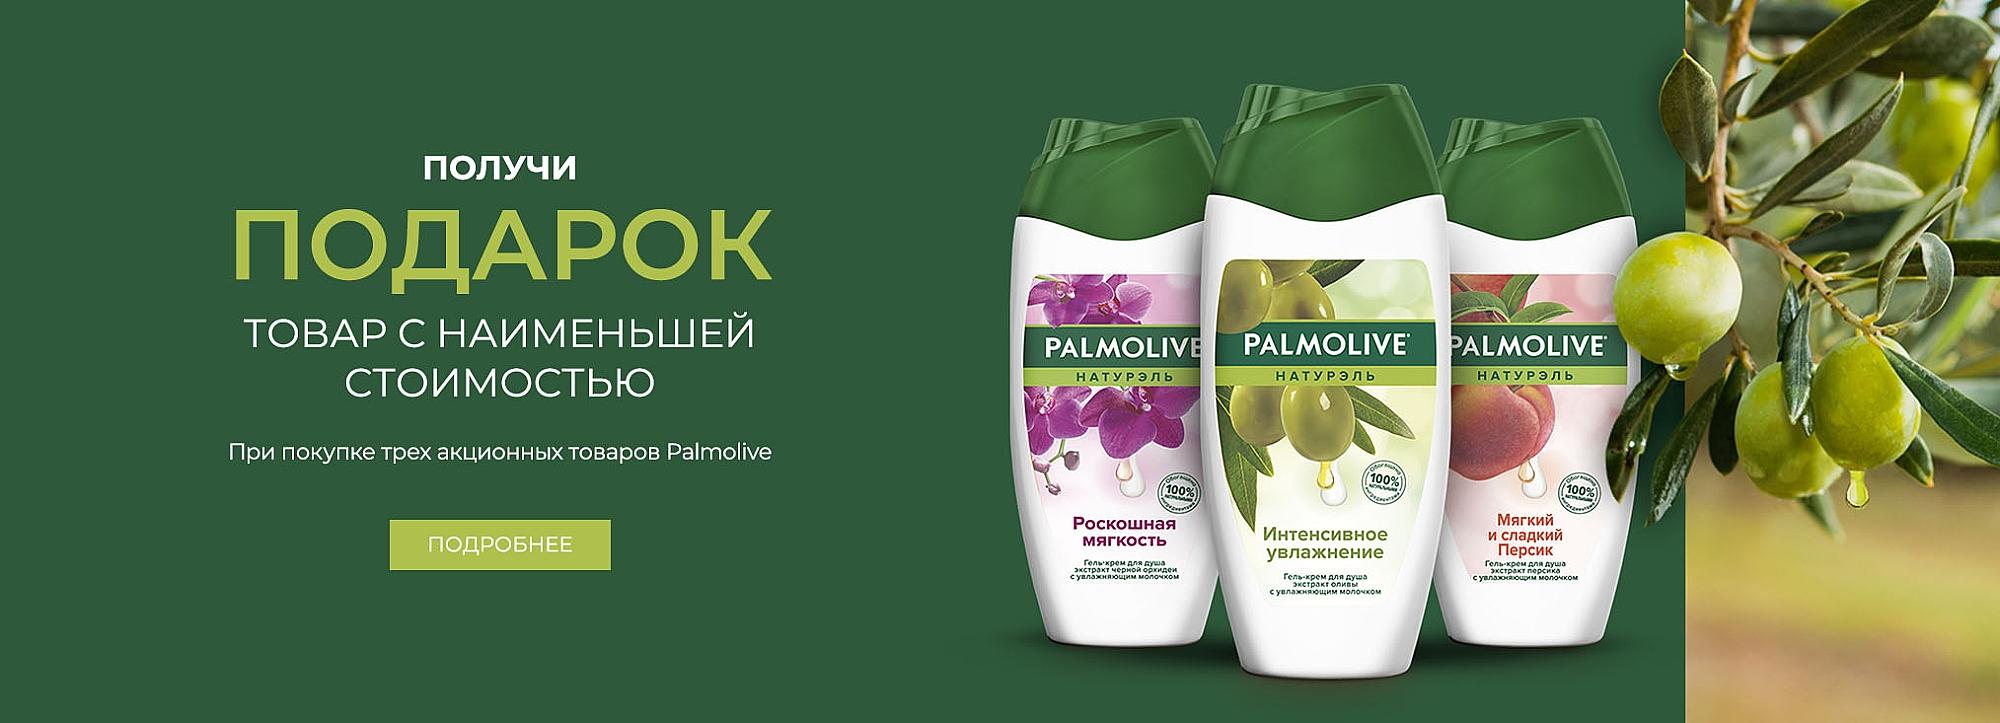 palmolive321073